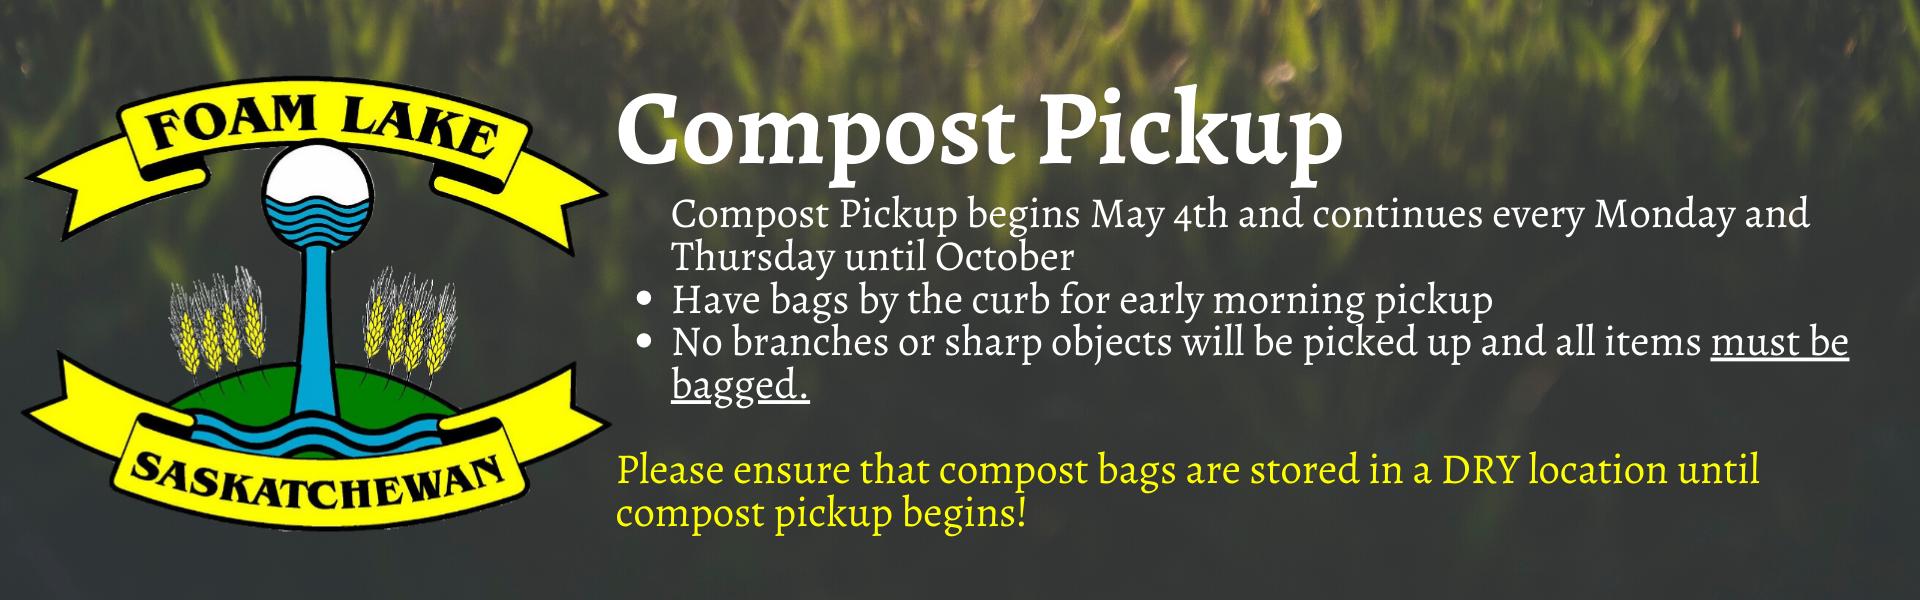 Copy of Compost Pickup begins May 4th (1)